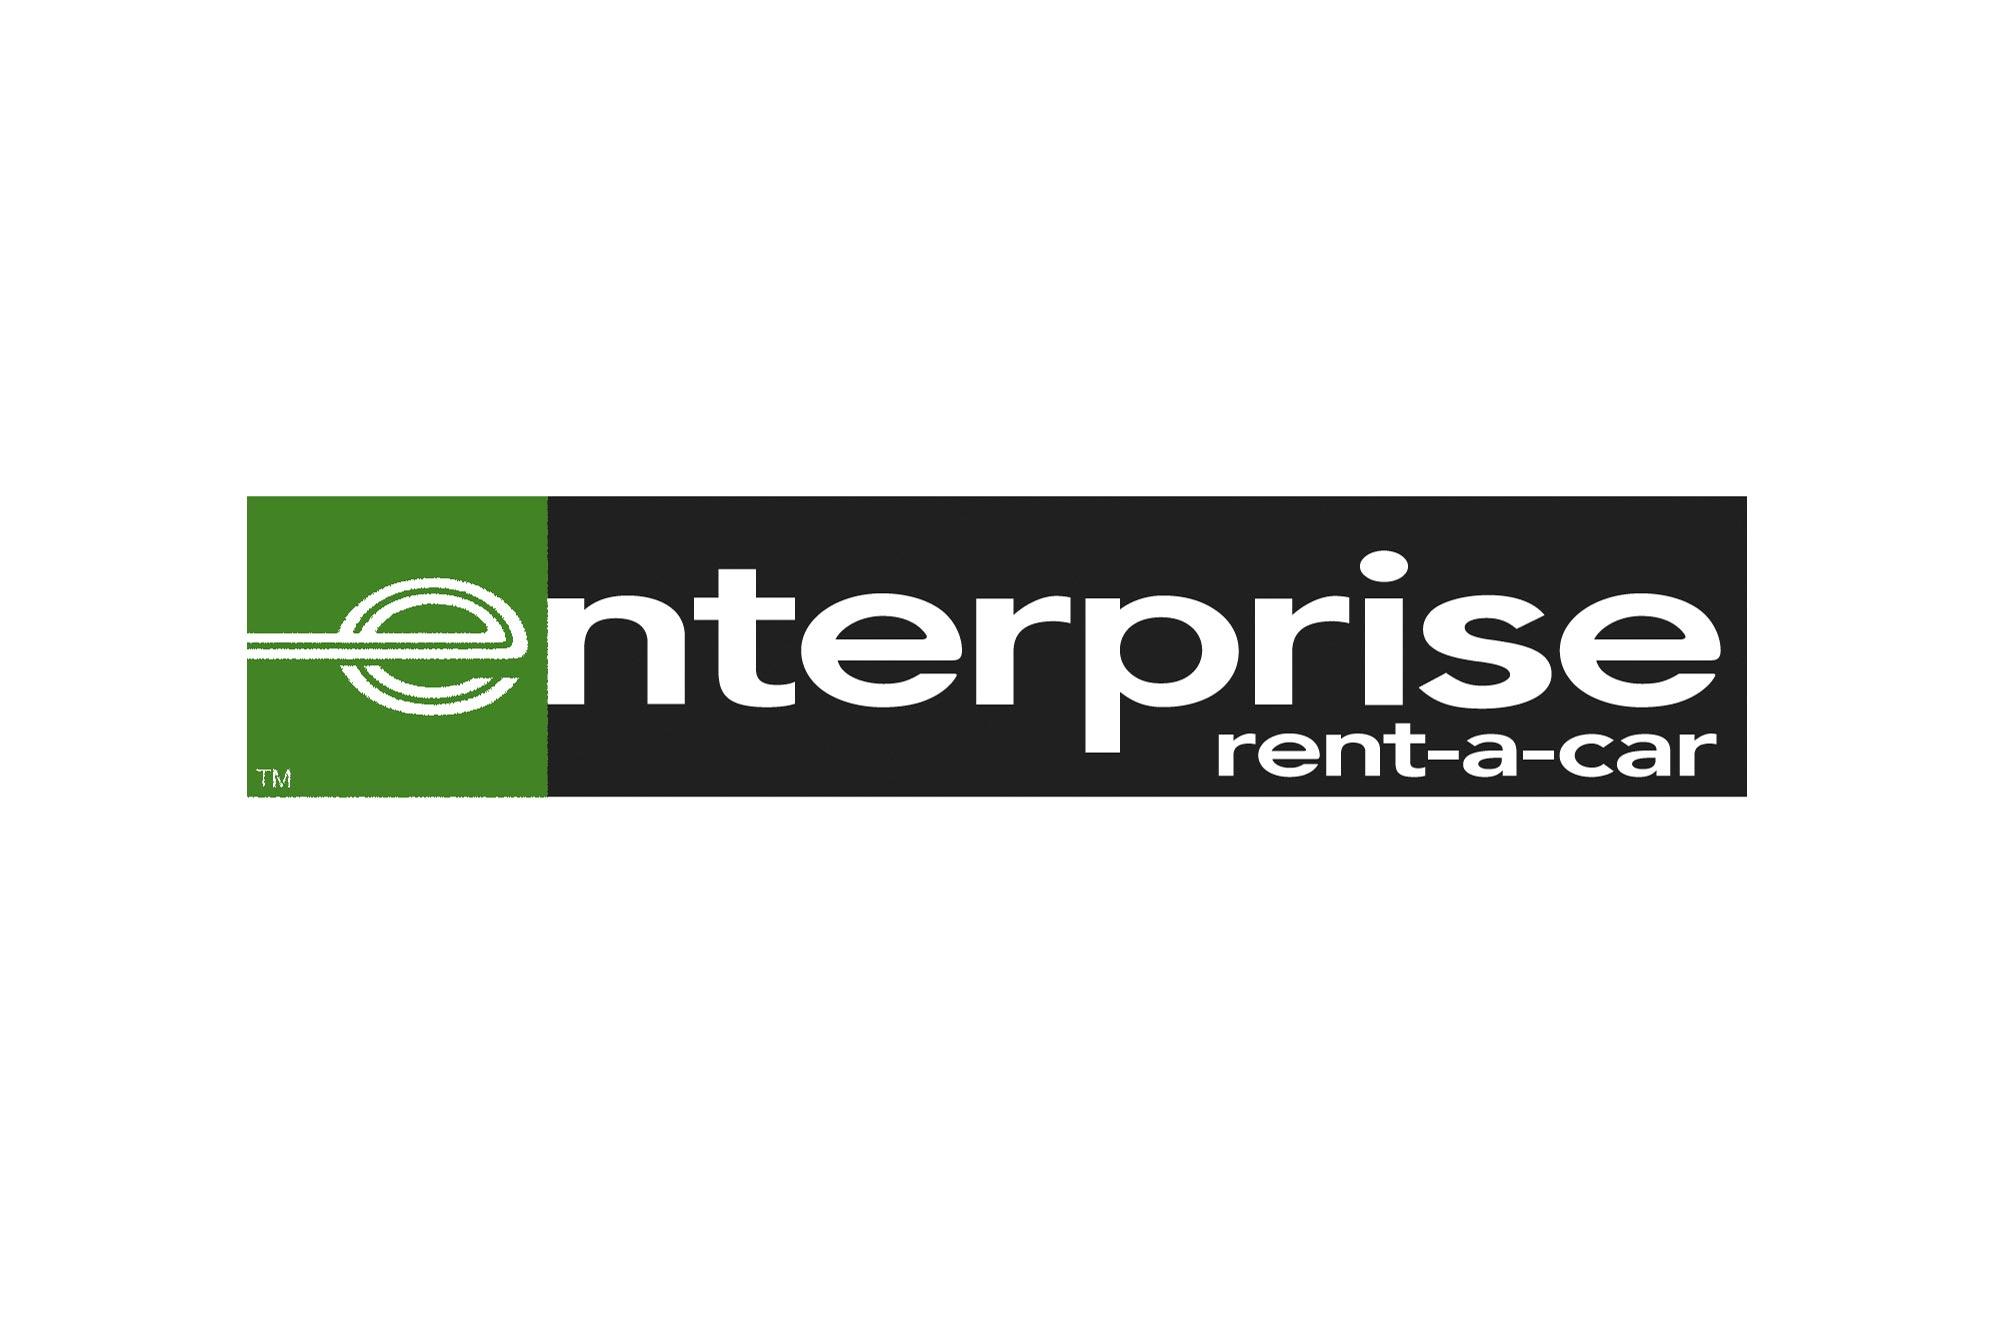 Enterprise Rent-A-Car Enters The Motorcycle Rental